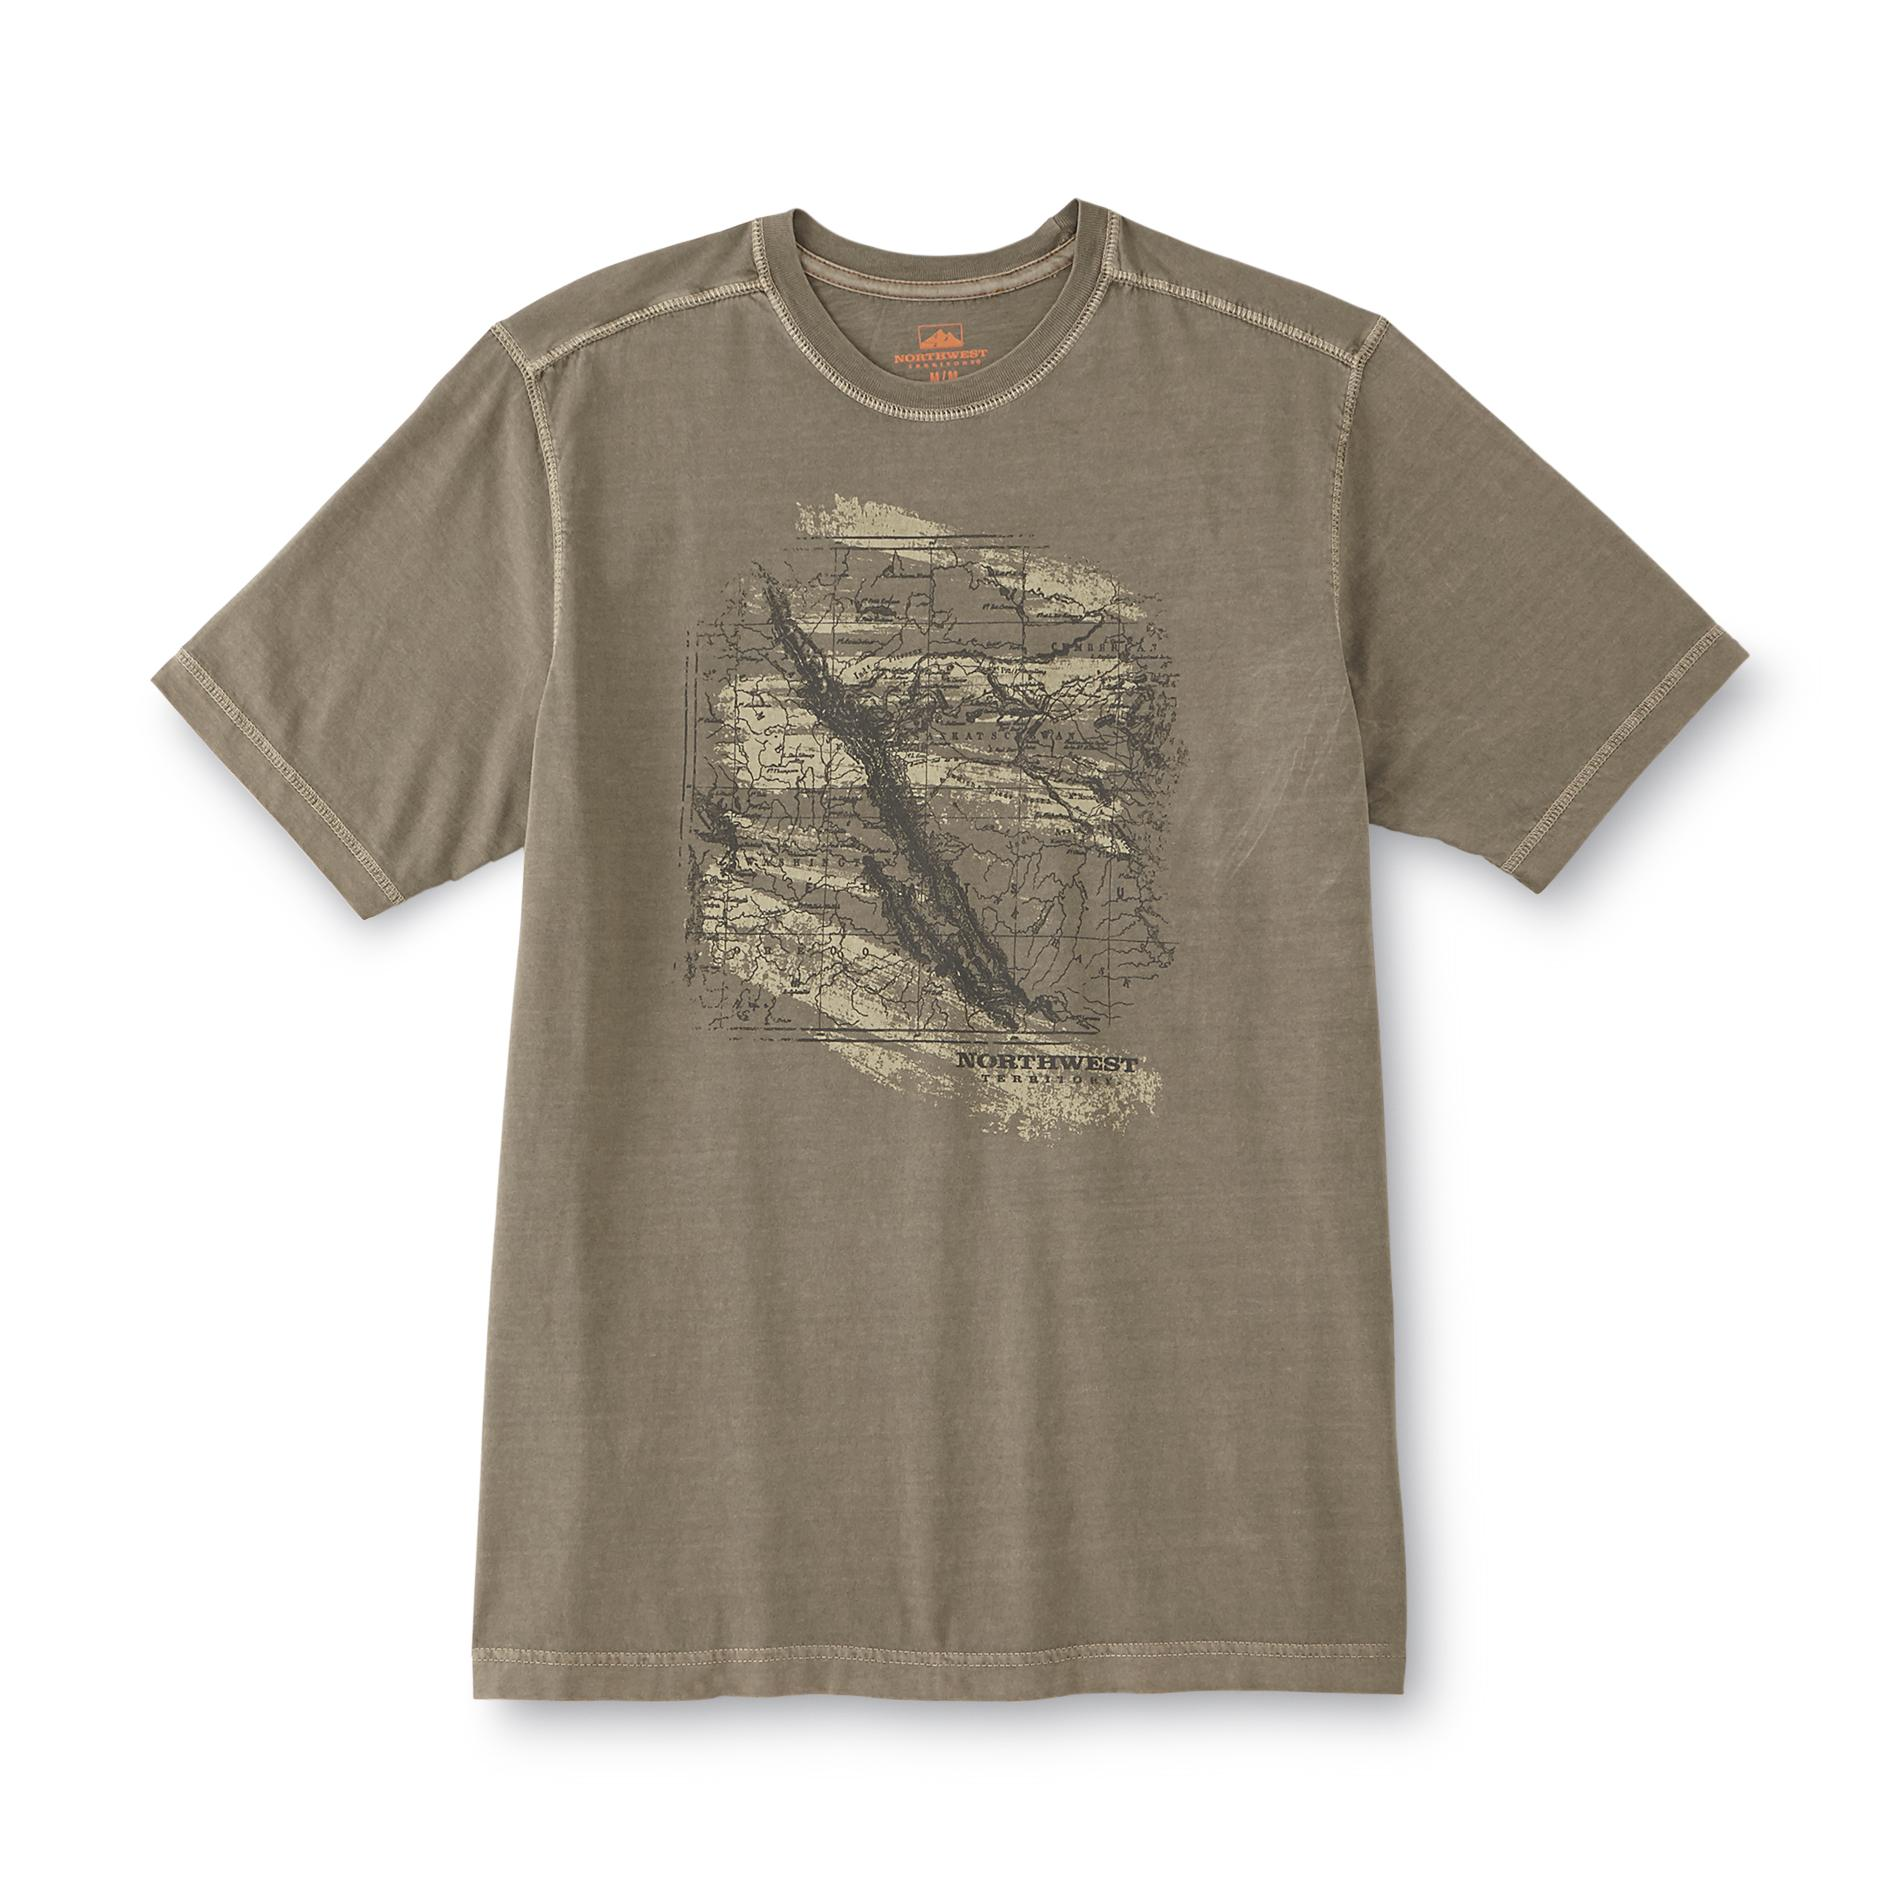 Northwest Territory Shirts